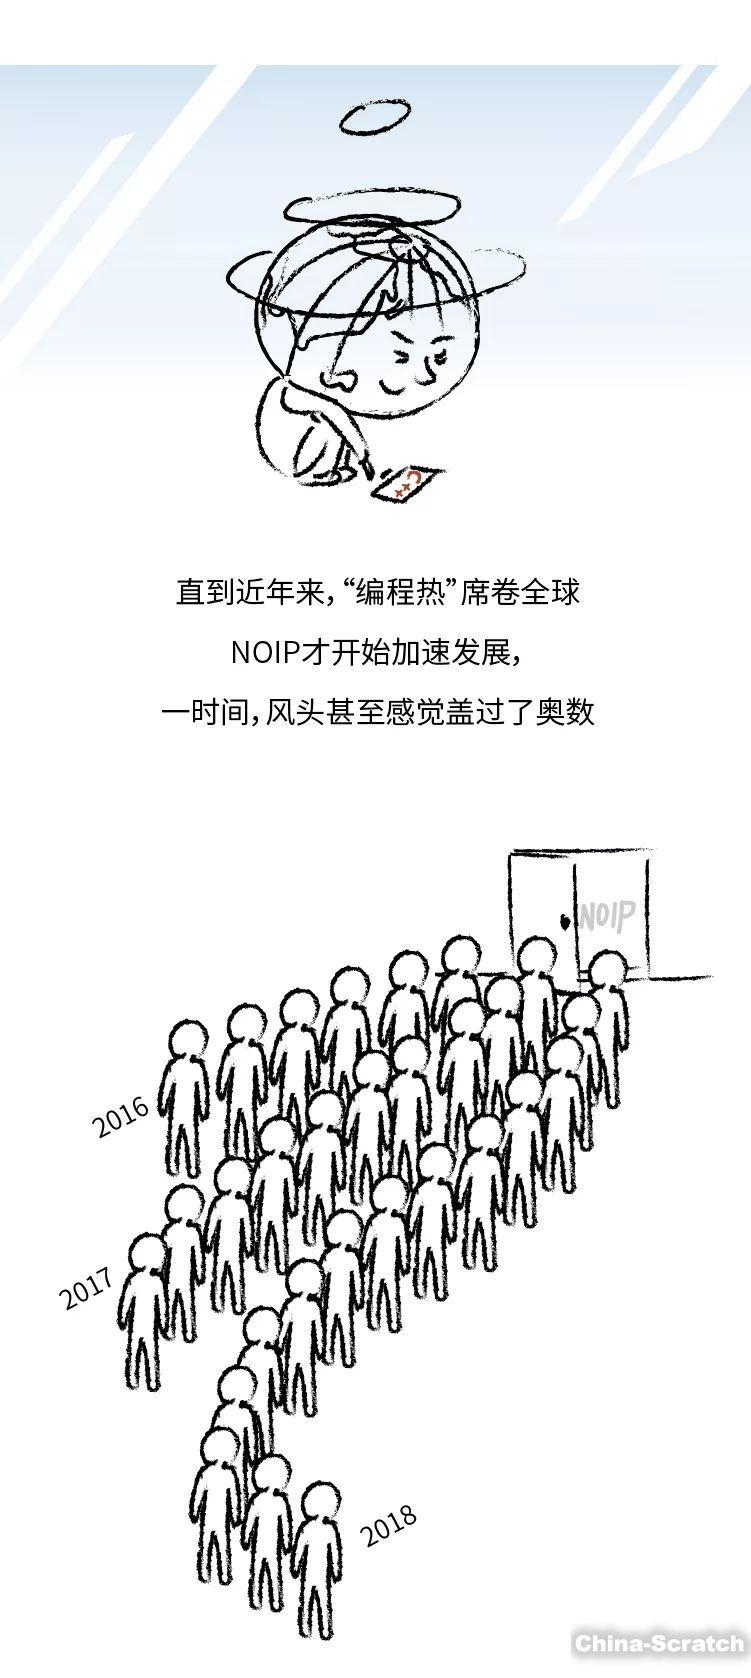 https://cdn.china-scratch.com/timg/190724/14305A933-2.jpg